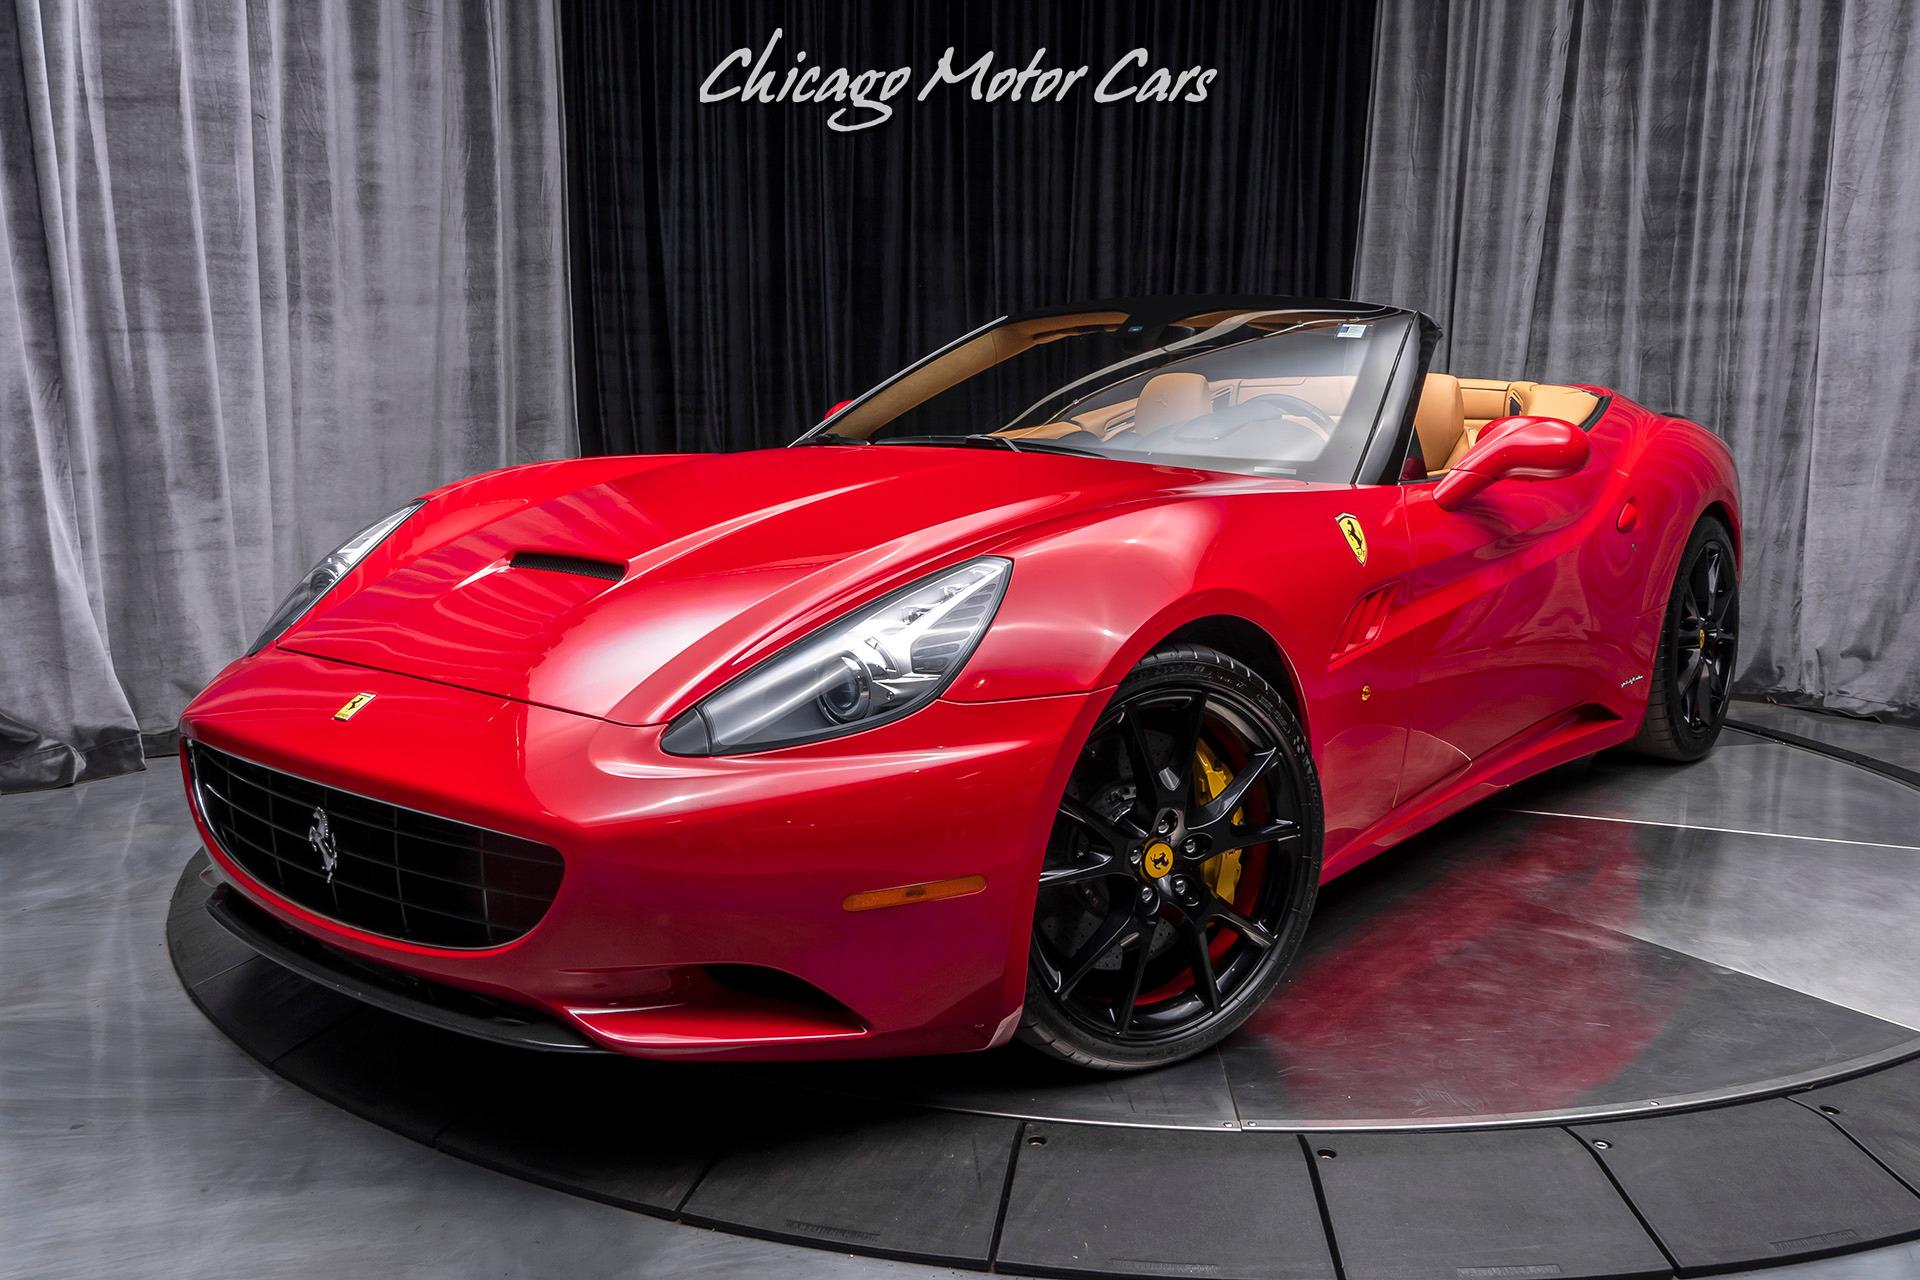 Used 2011 Ferrari California For Sale ($99,800)   Chicago ...